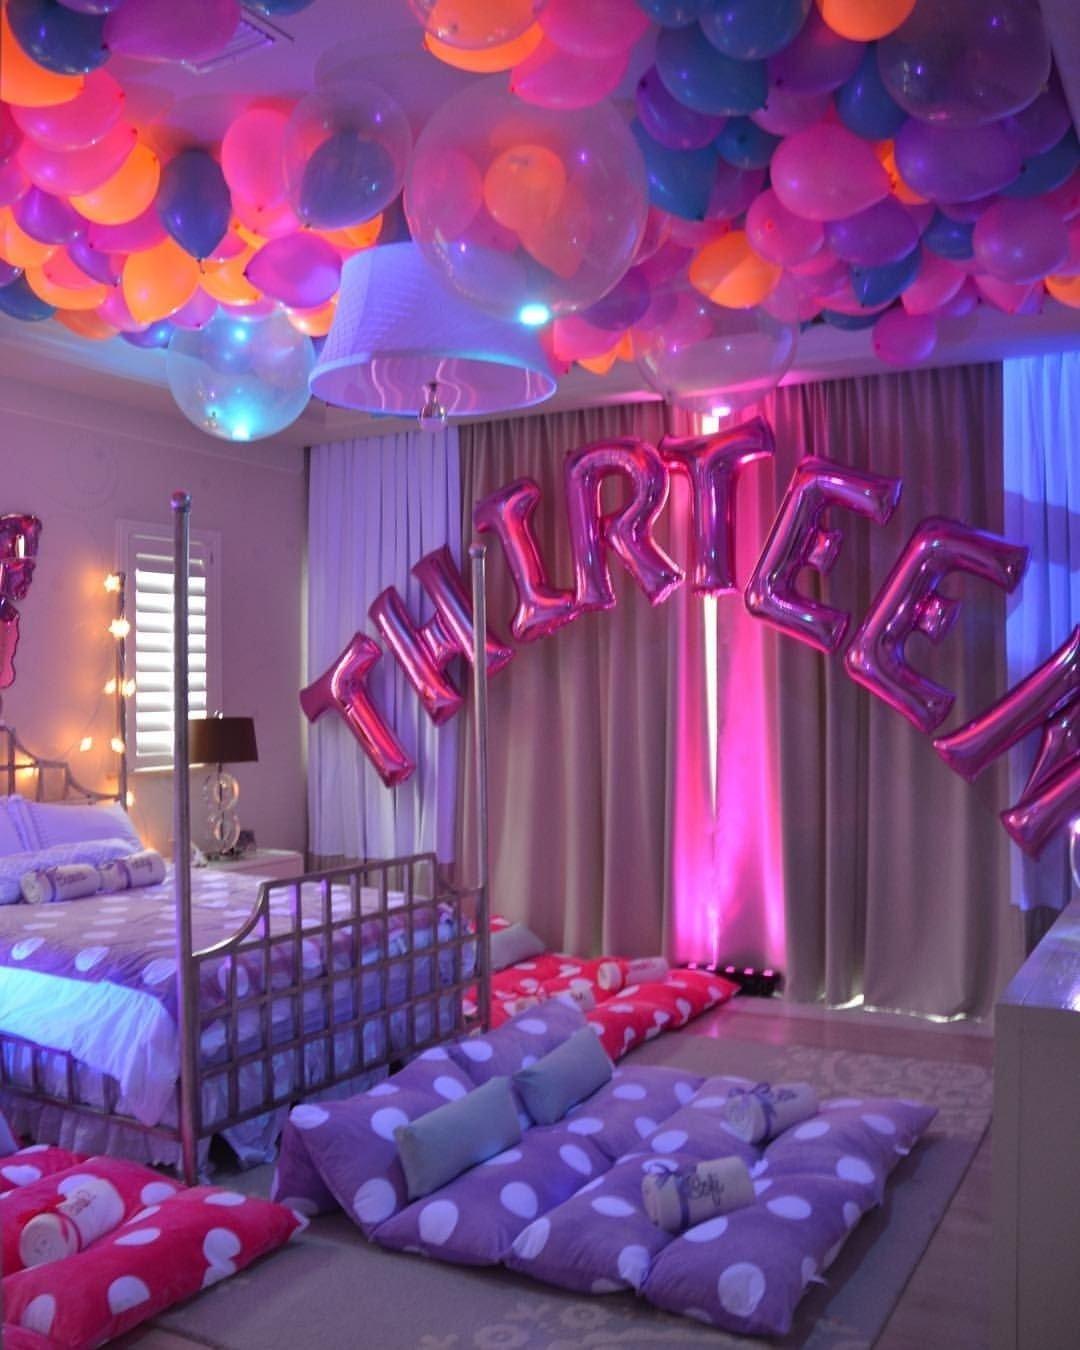 10 Stylish Birthday Ideas For 13 Year Old Girl pinstacey refermat on hayley 13 xmas pinterest girls dream 4 2020